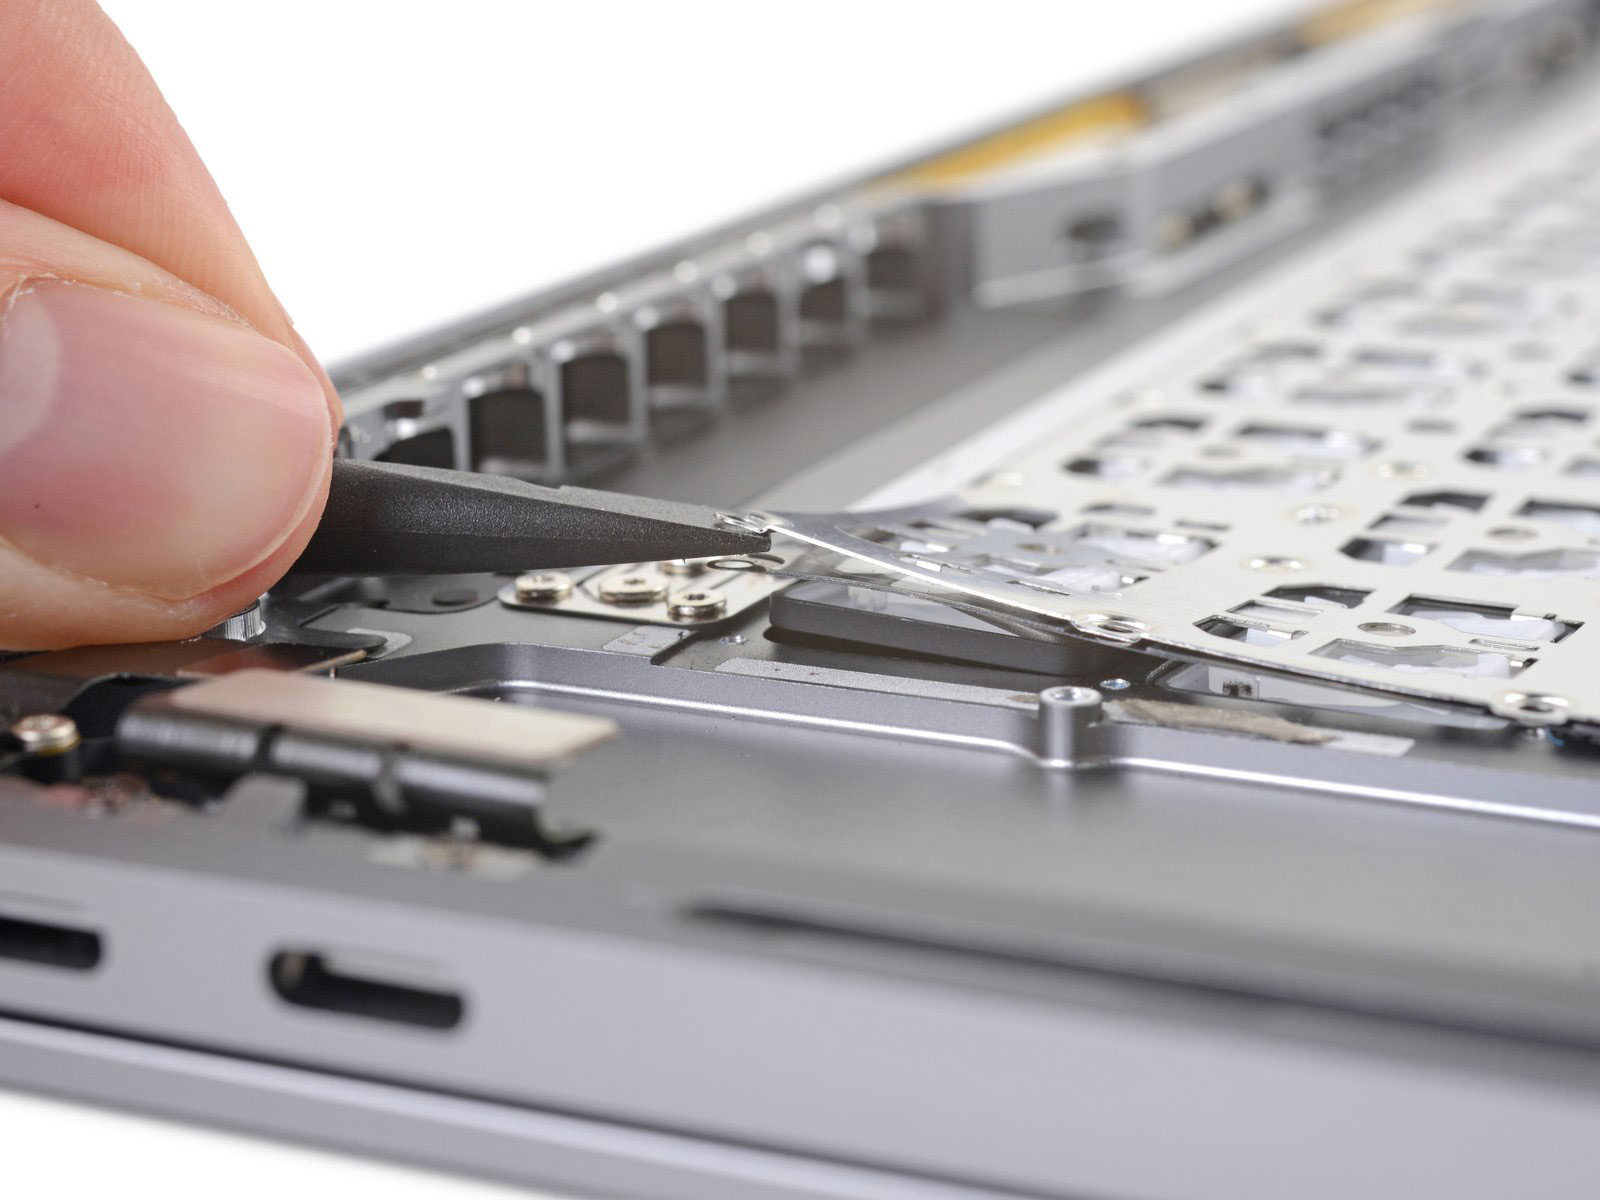 Macbook Pro 16 Tastatur Weiterhin Fest Vernietet Ifun De